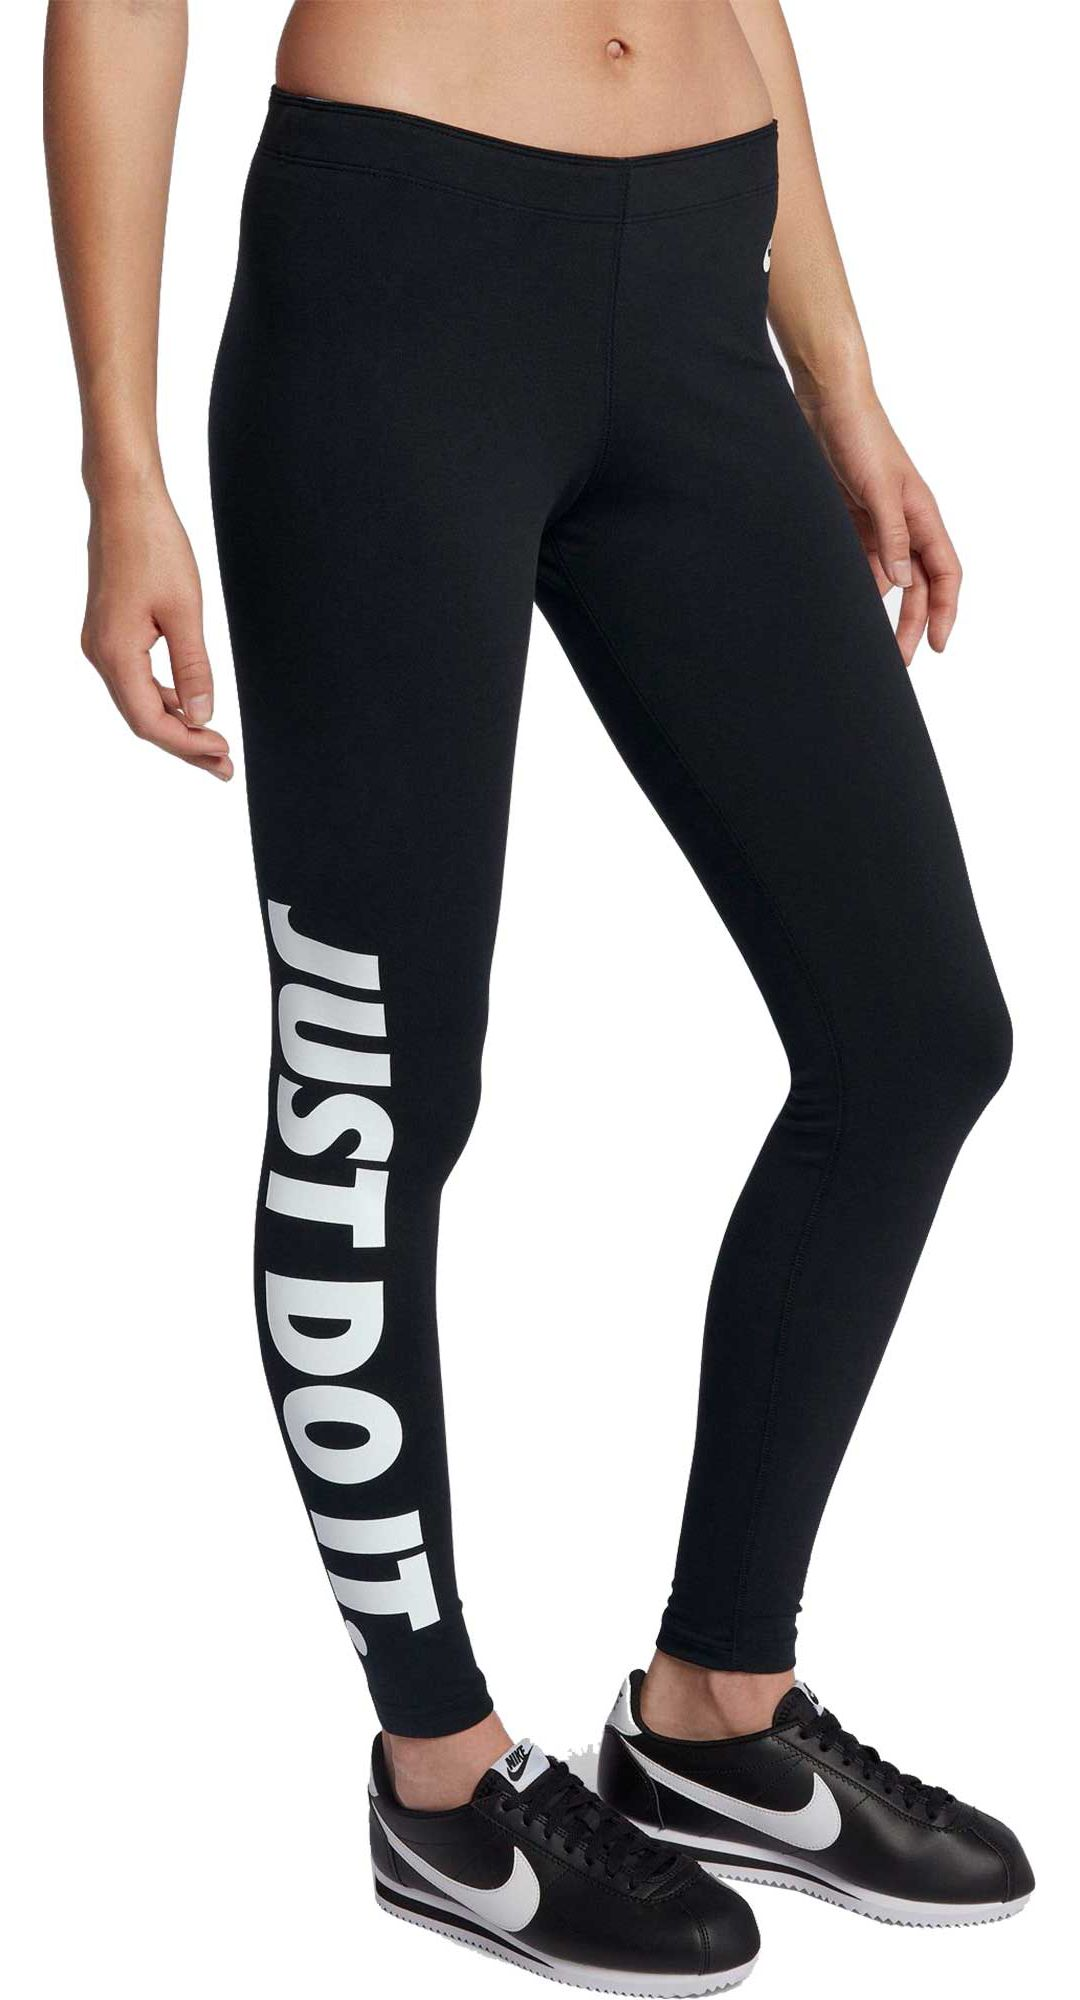 46b42d881d0b4d Nike Women's Sportswear Just Do It Leg-A-See Leggings. noImageFound.  Previous